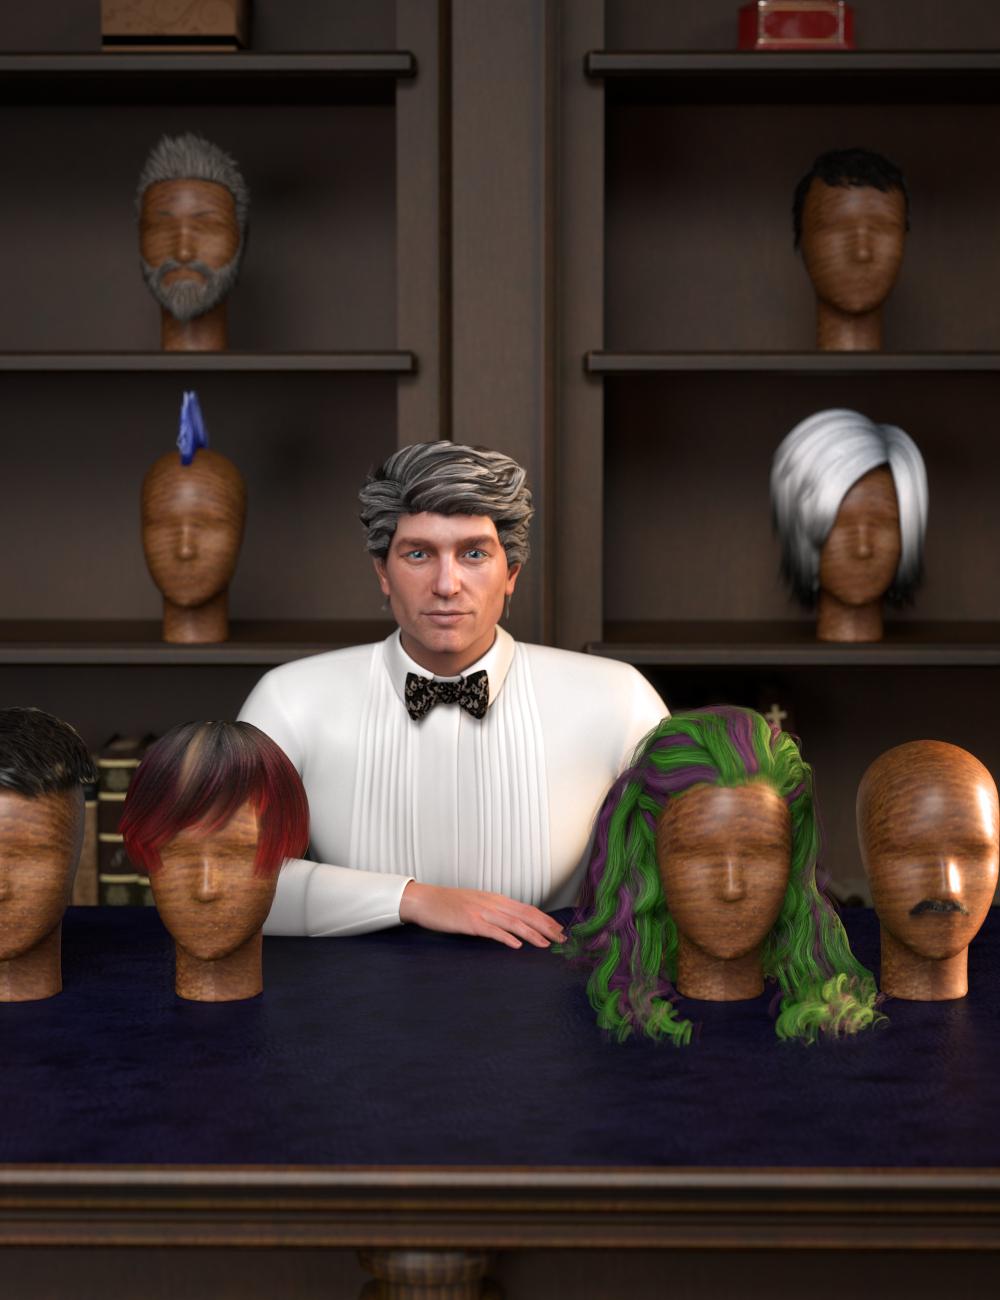 RSSY Hair Converter from Genesis 2 Male to Genesis 8 Male by: SickleyieldRiverSoft Art, 3D Models by Daz 3D